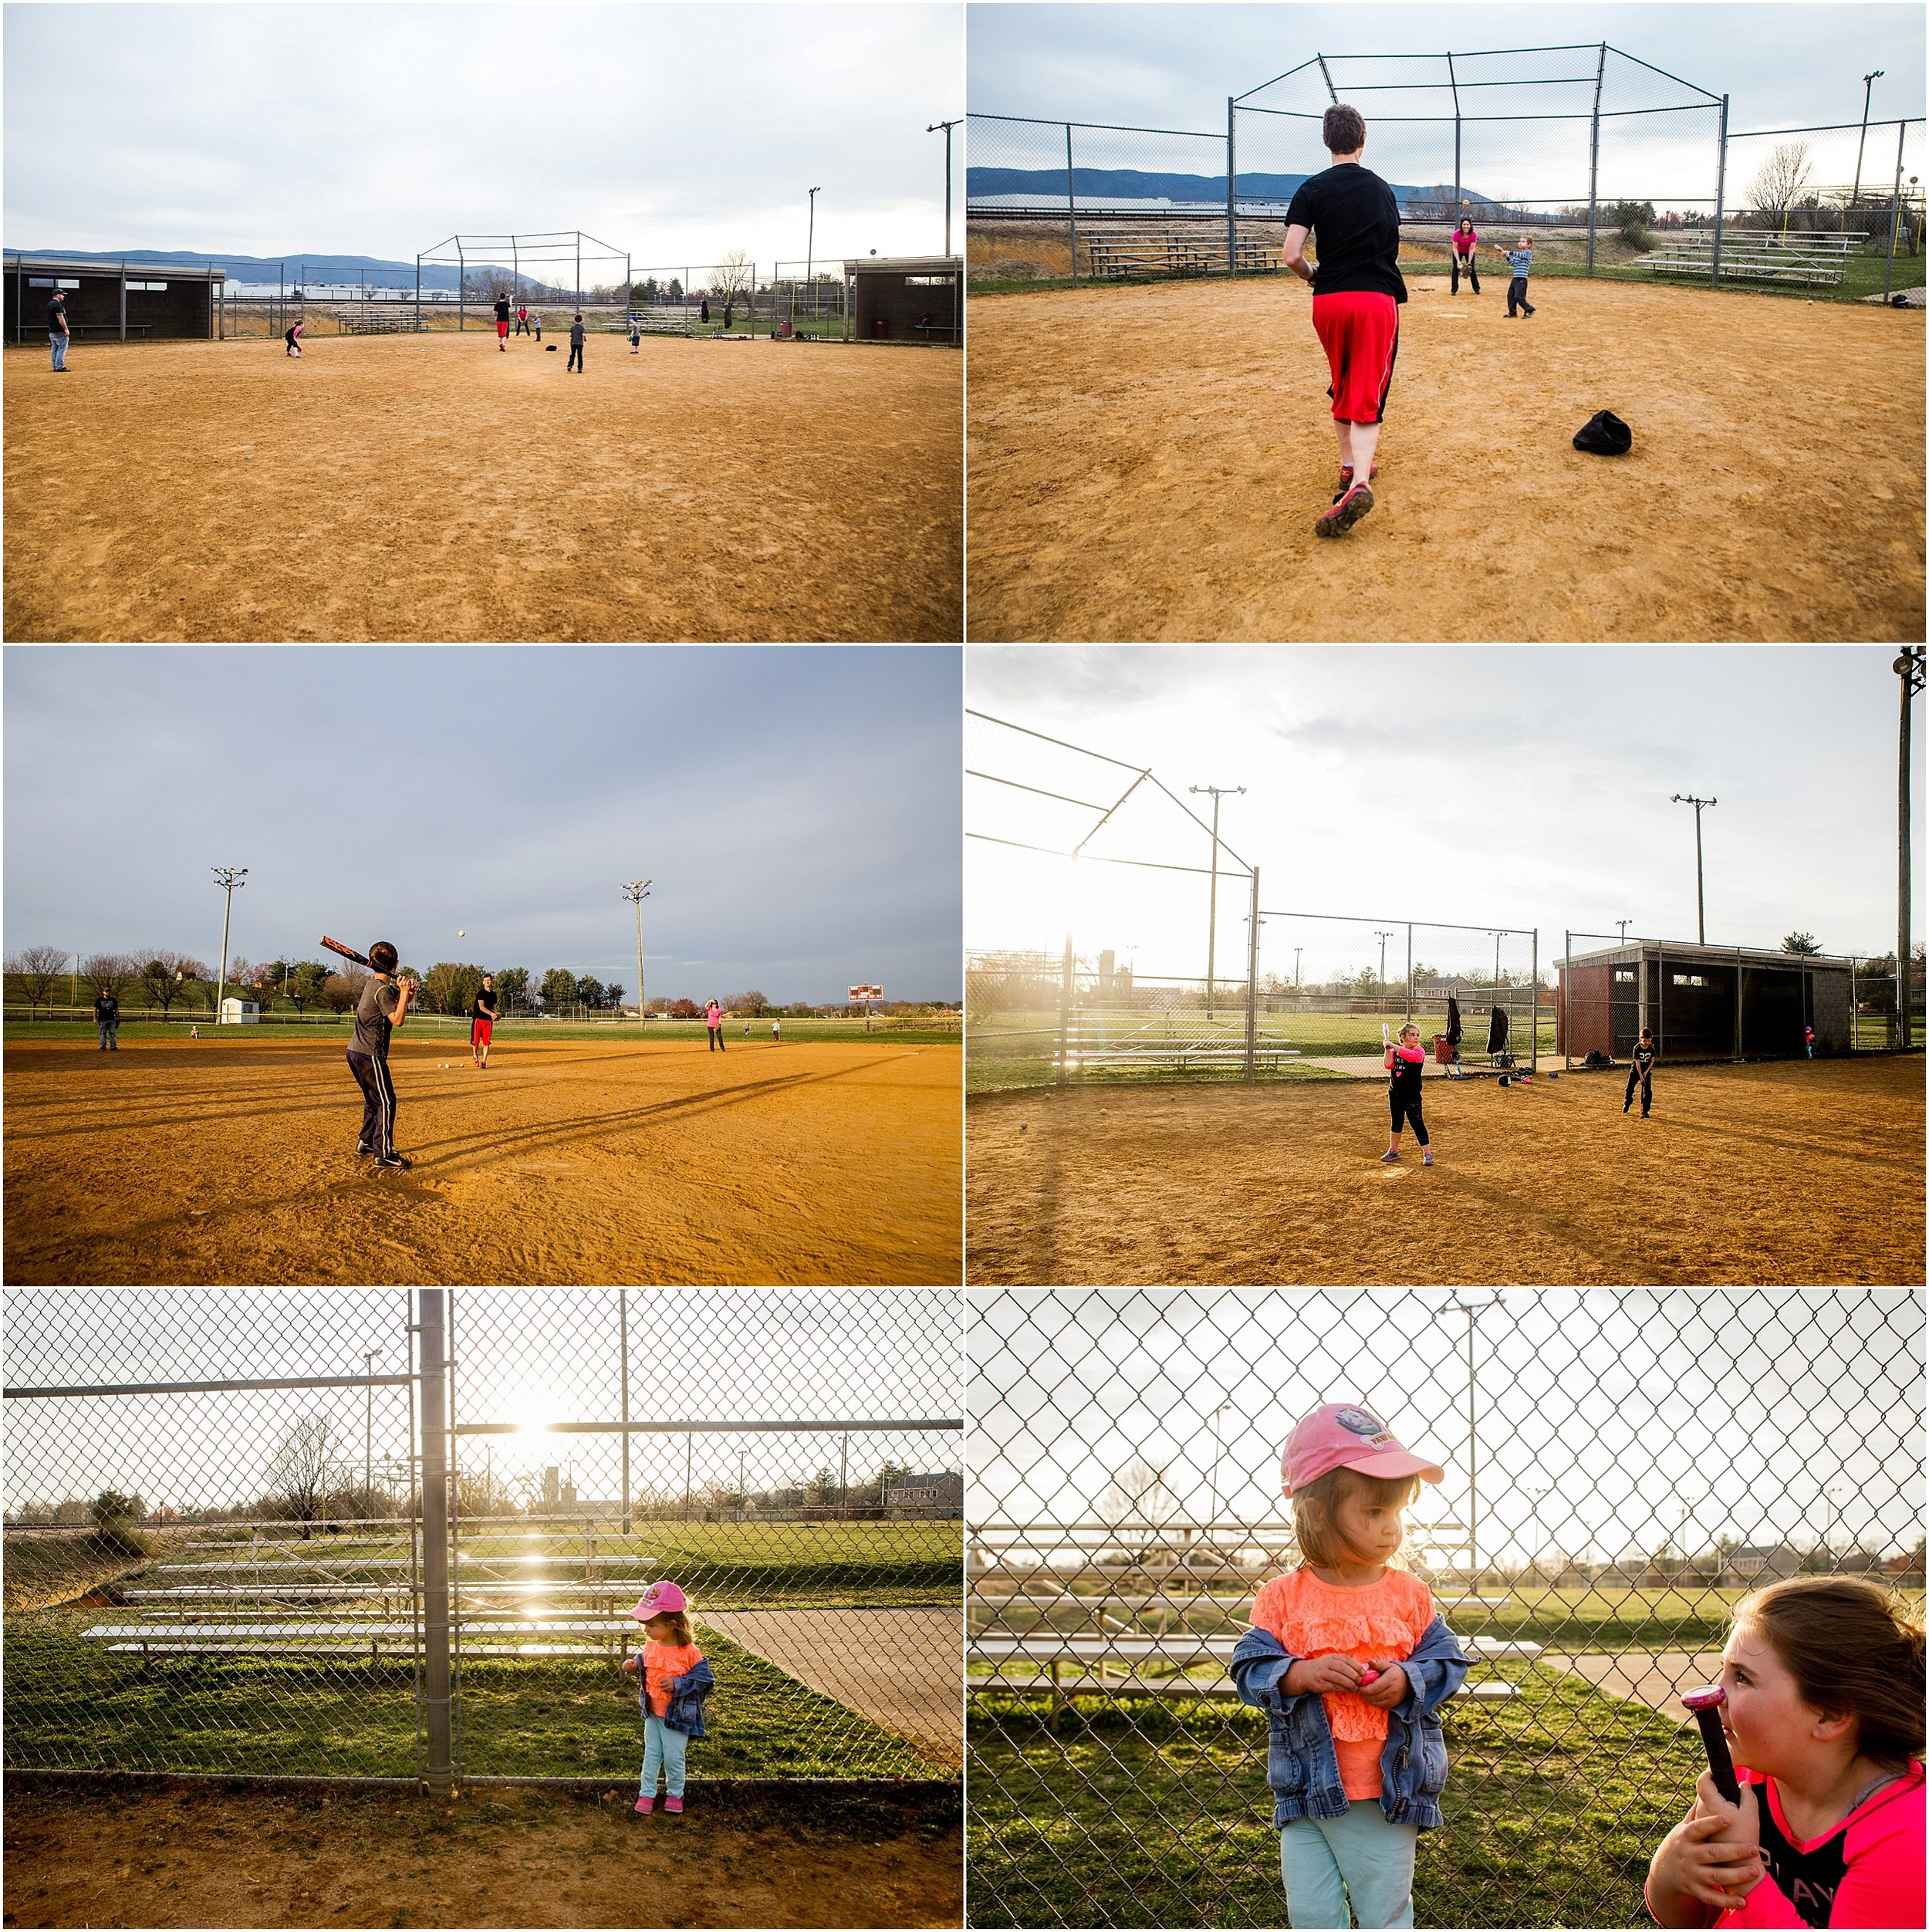 baseball in Stuarts Draft, Virginia